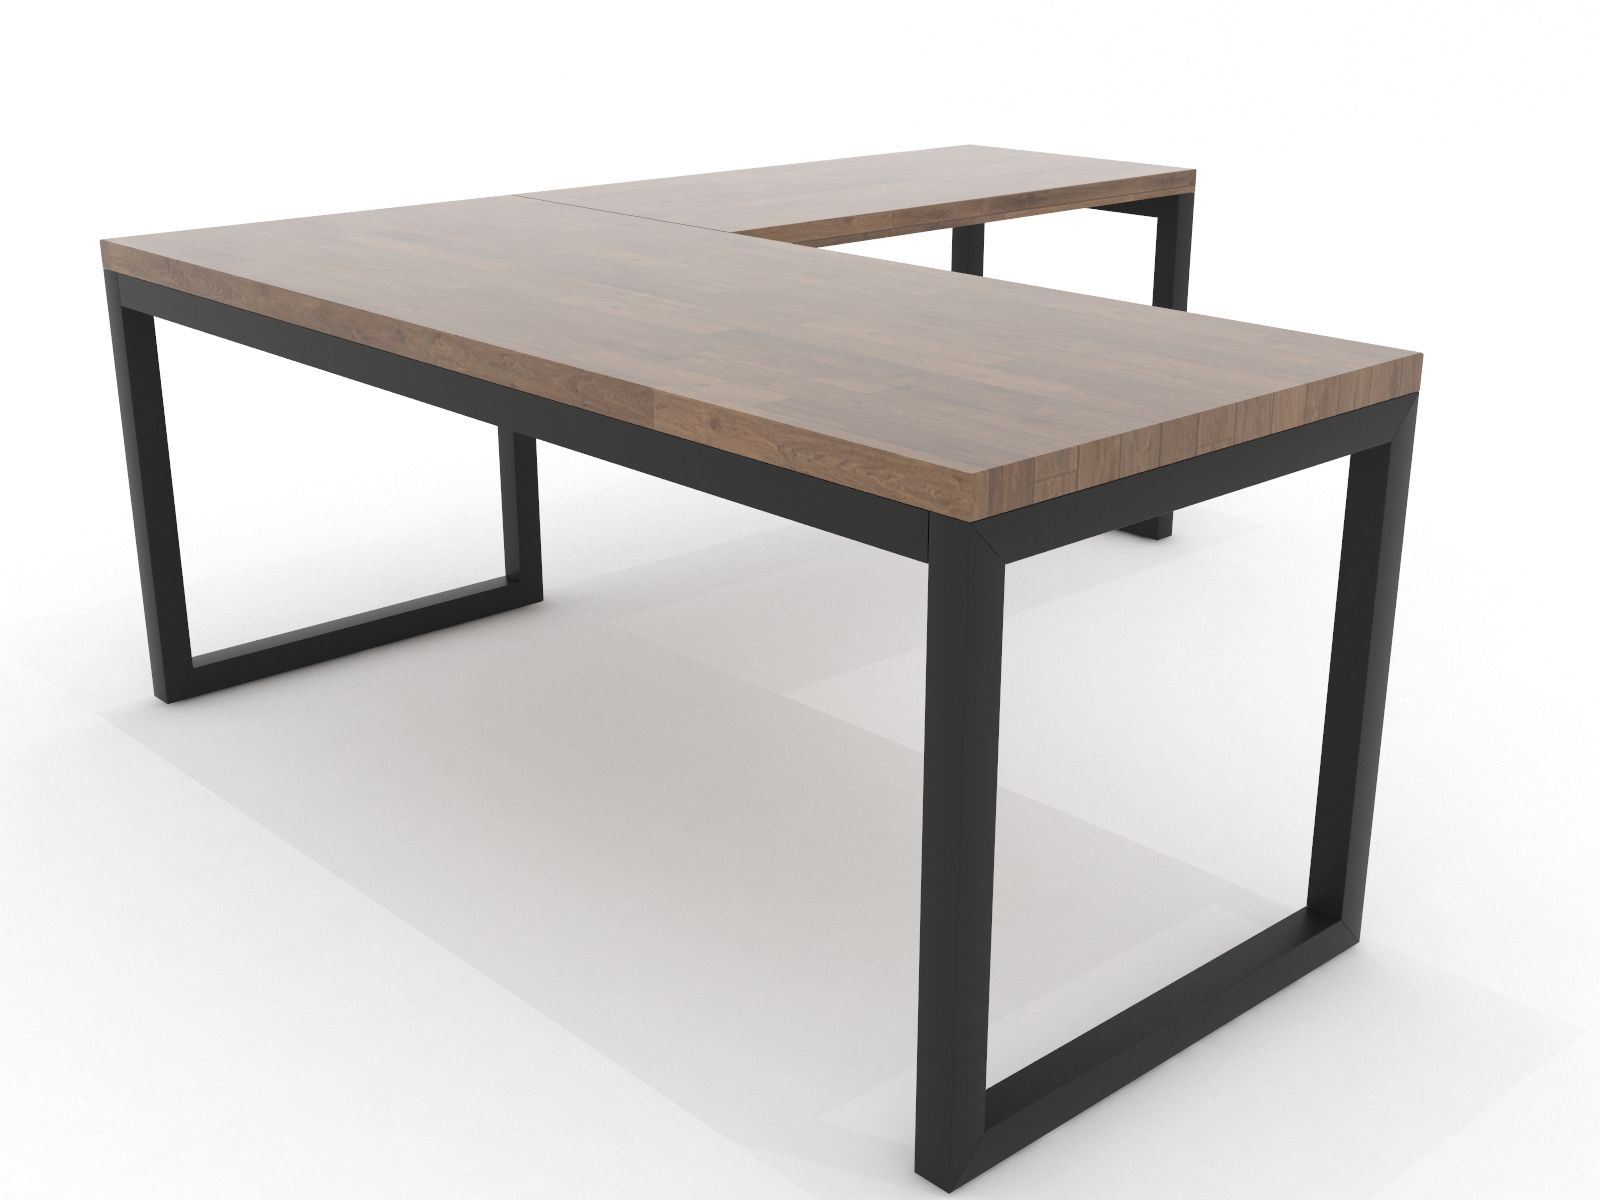 Iron Age Office   Rowan Desk   Office furniture design, Home ...